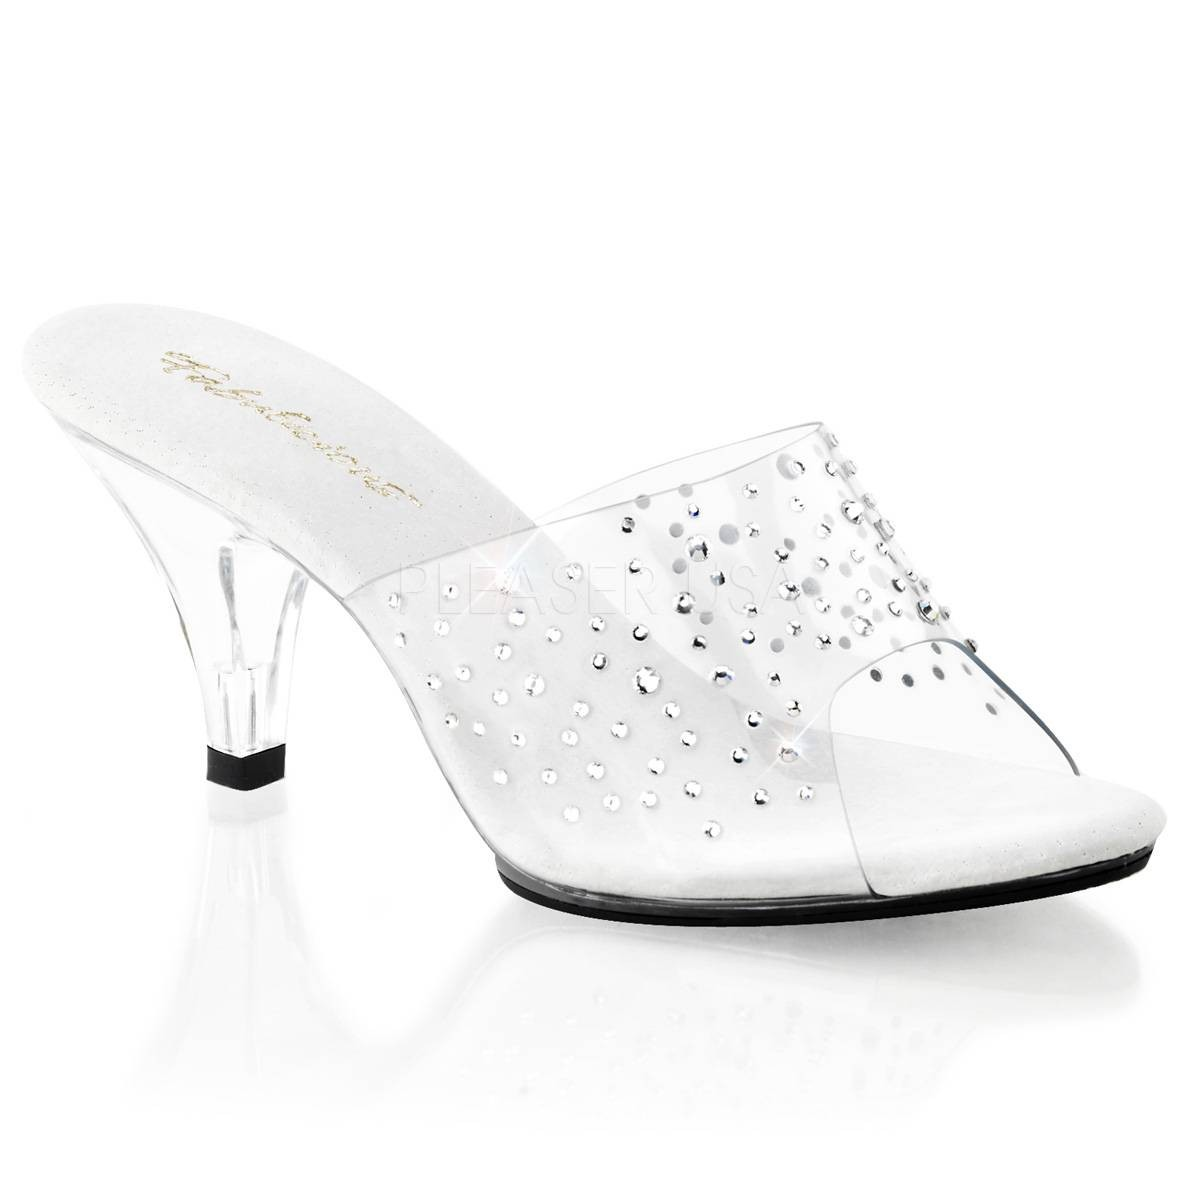 Sandalen - BELLE 301RS ° Damen Sandalette ° Transparent Matt ° Fabulicious  - Onlineshop RedSixty